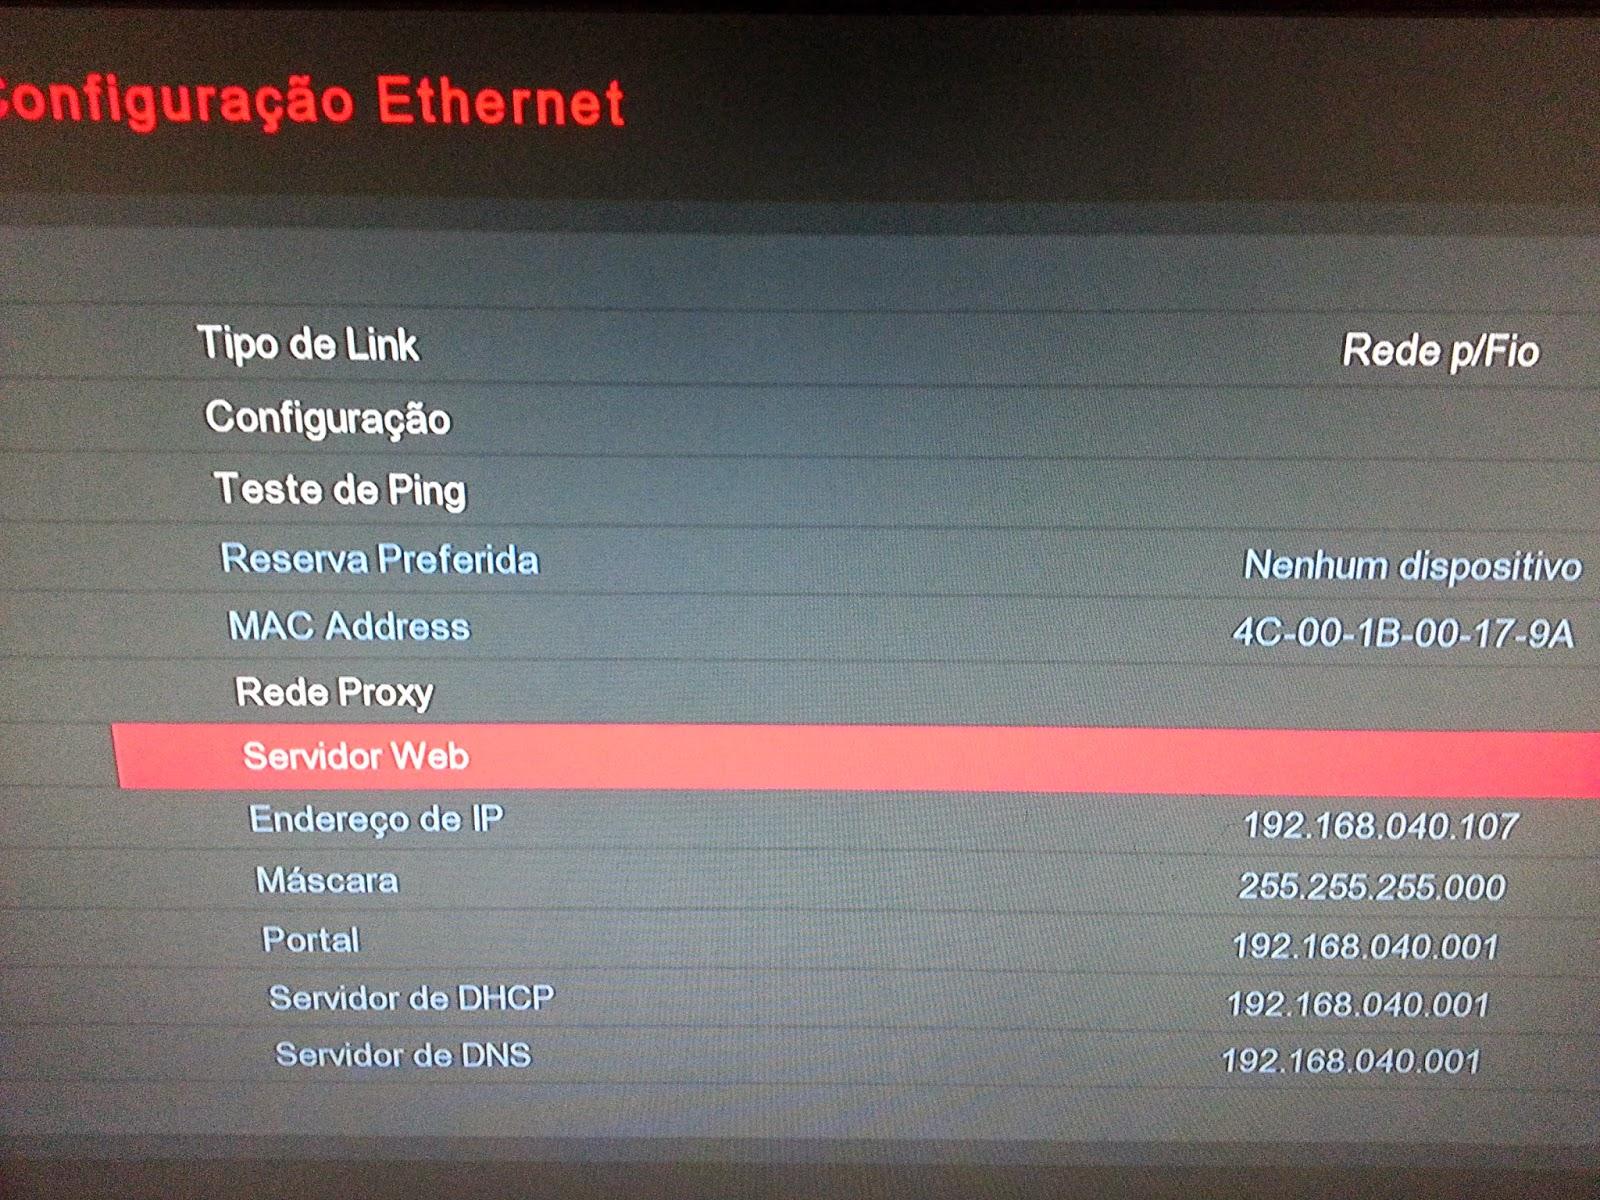 Audisat A1 HD COMO INSTALAR O WEB REMOTE imagem 5